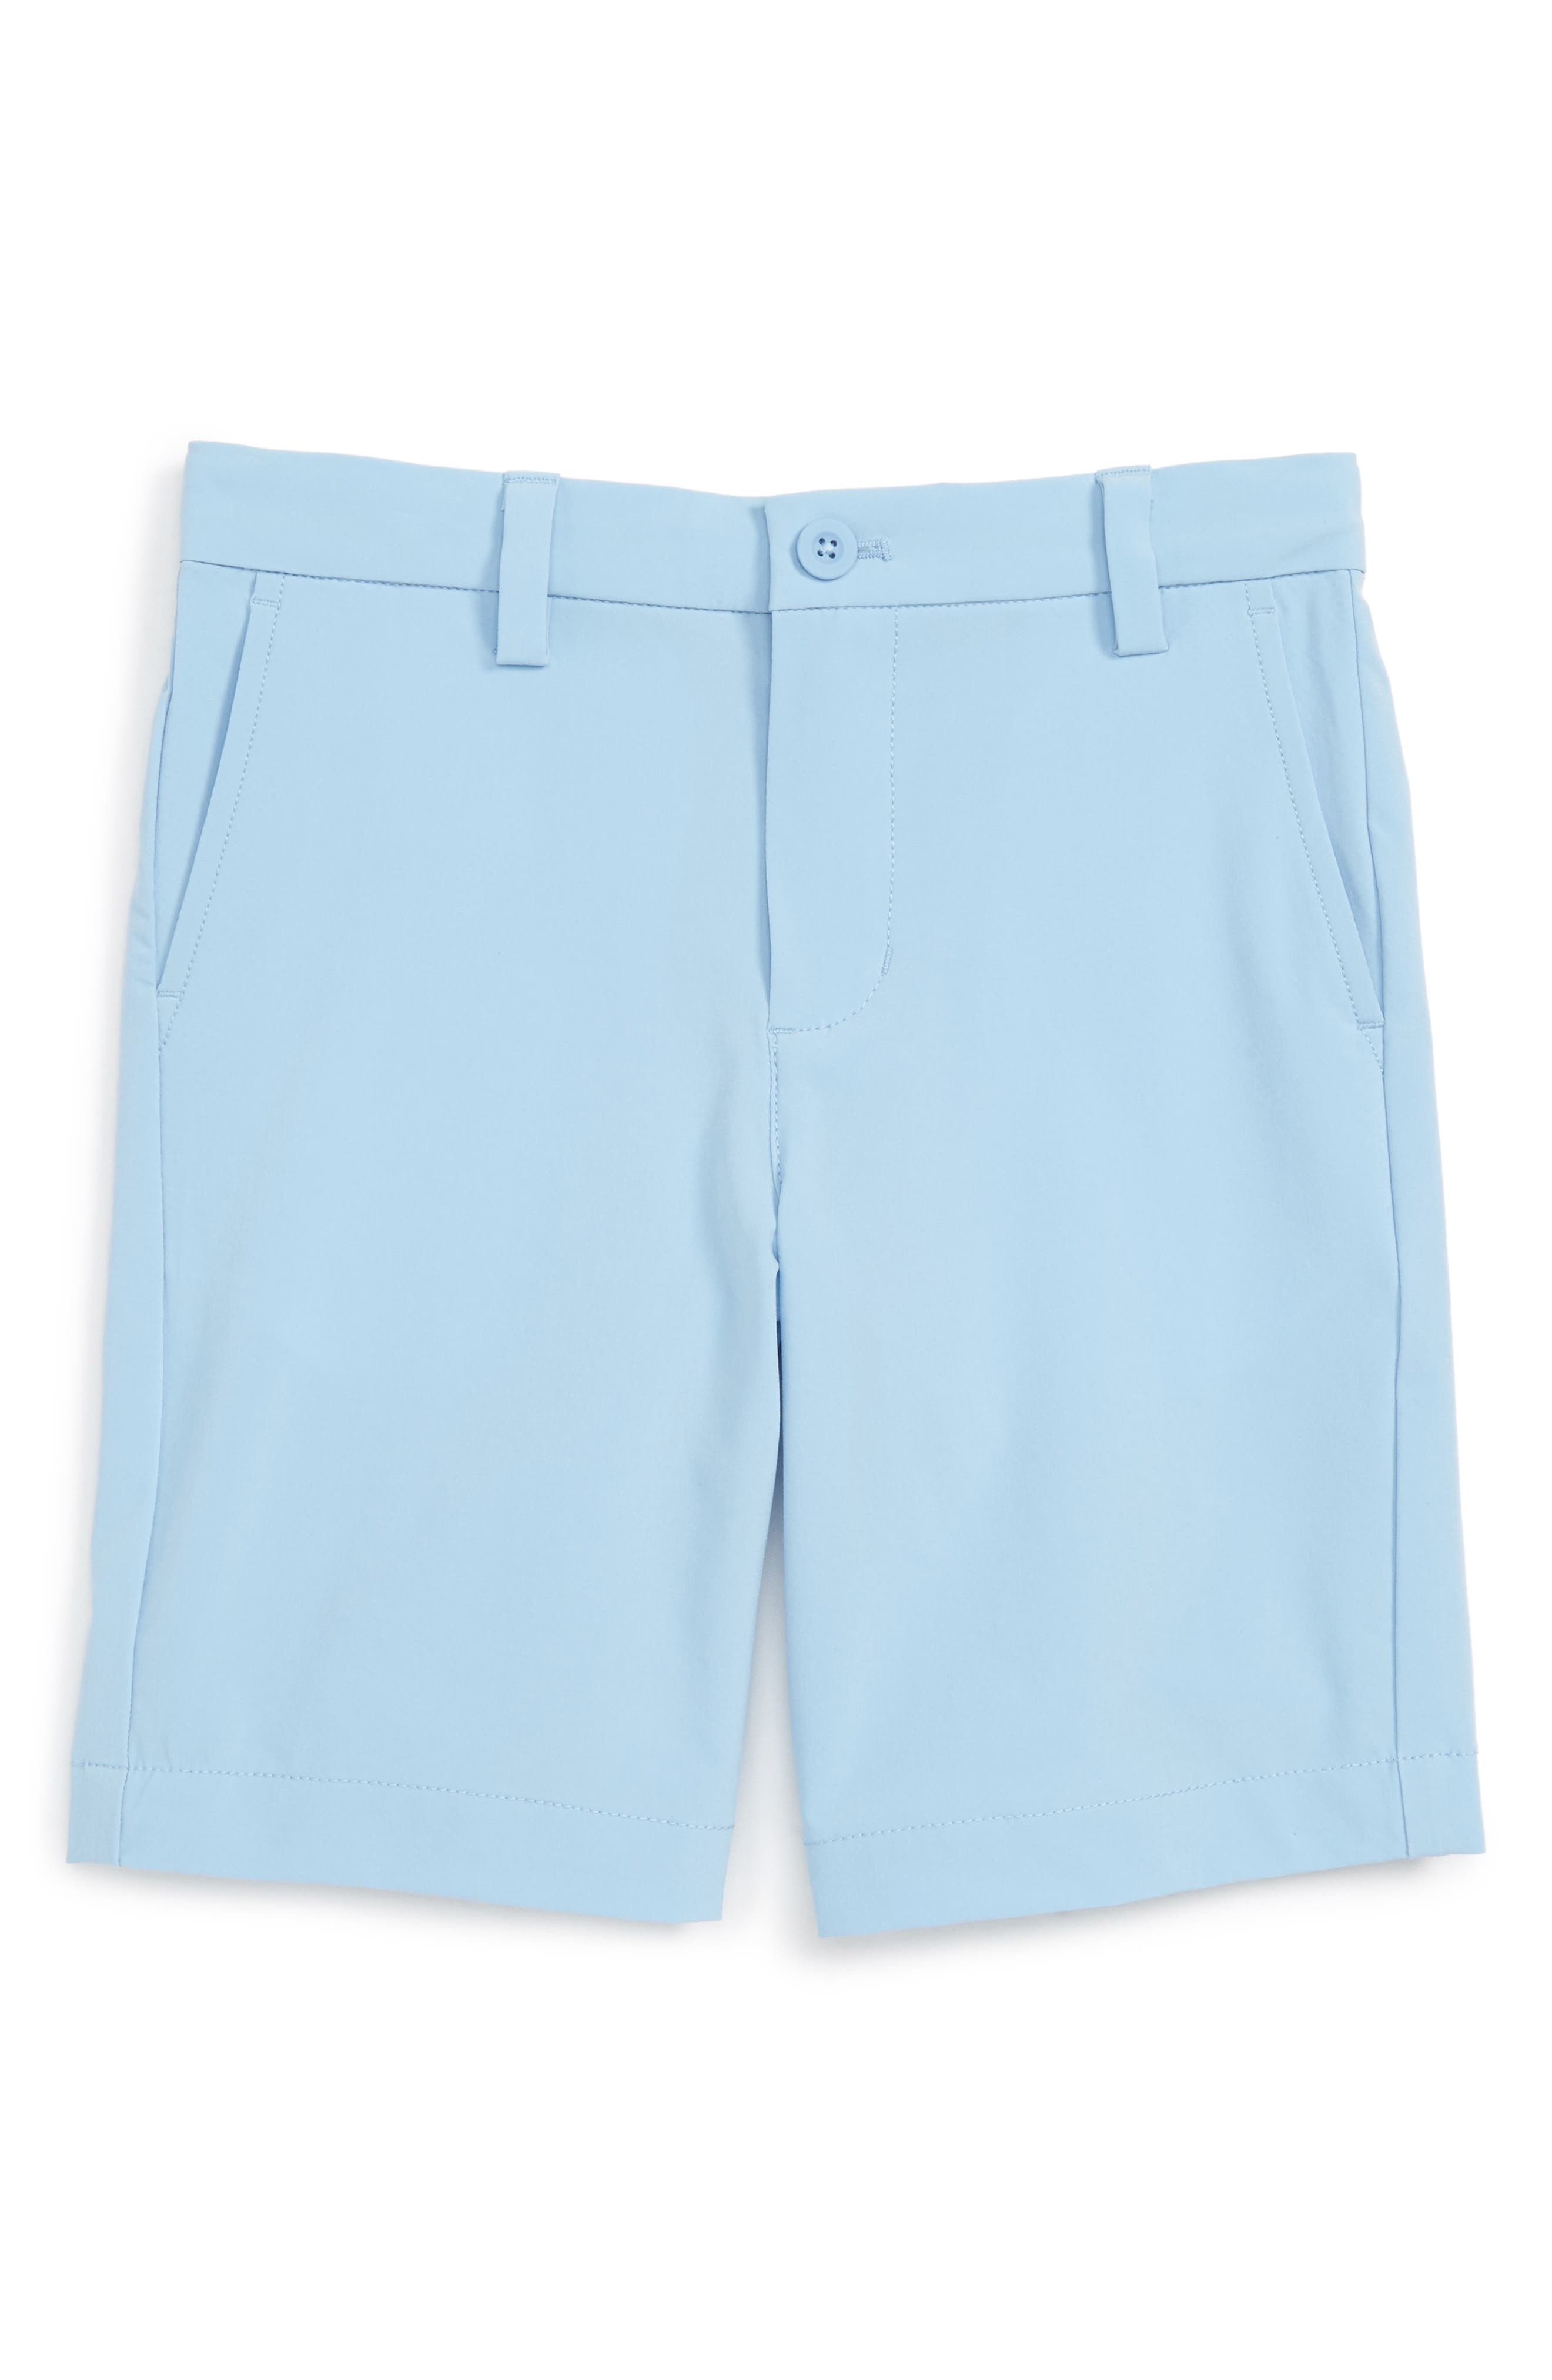 Vineyard Vines Breaker Hybrid Shorts (Toddler Boys, Little Boys & Big Boys)